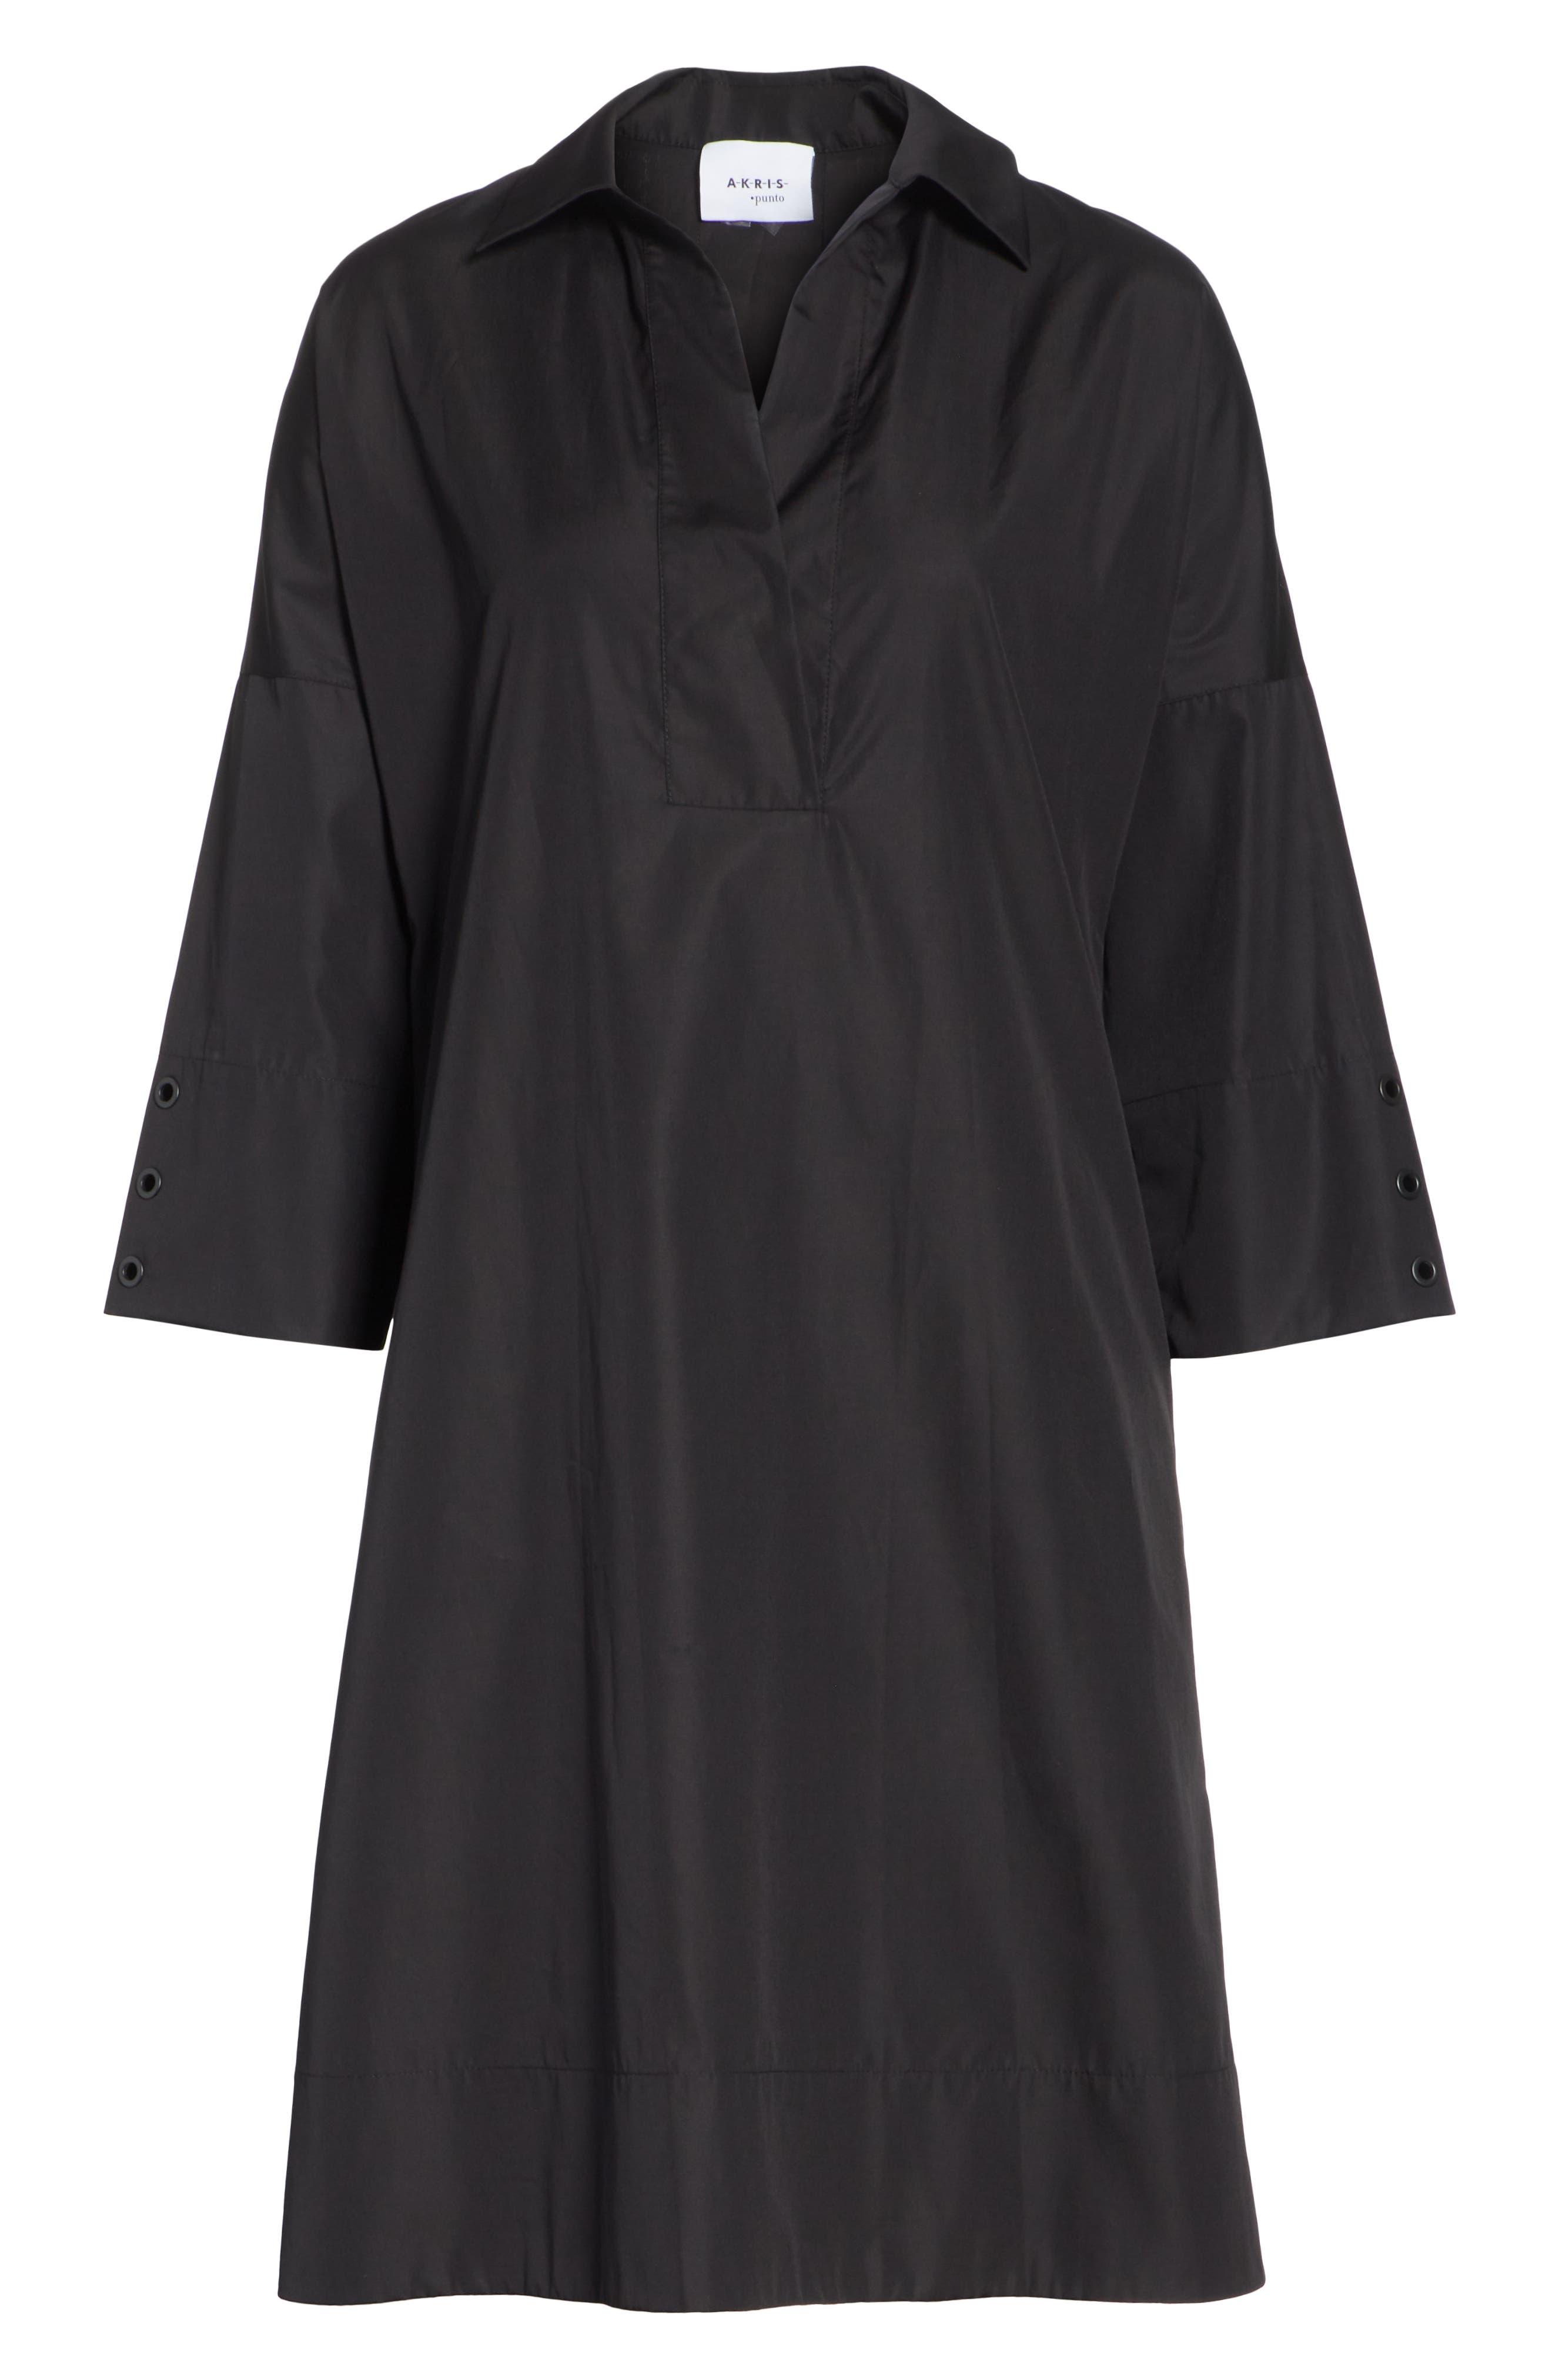 Eyelet Detail Cotton Dress,                             Alternate thumbnail 7, color,                             BLACK